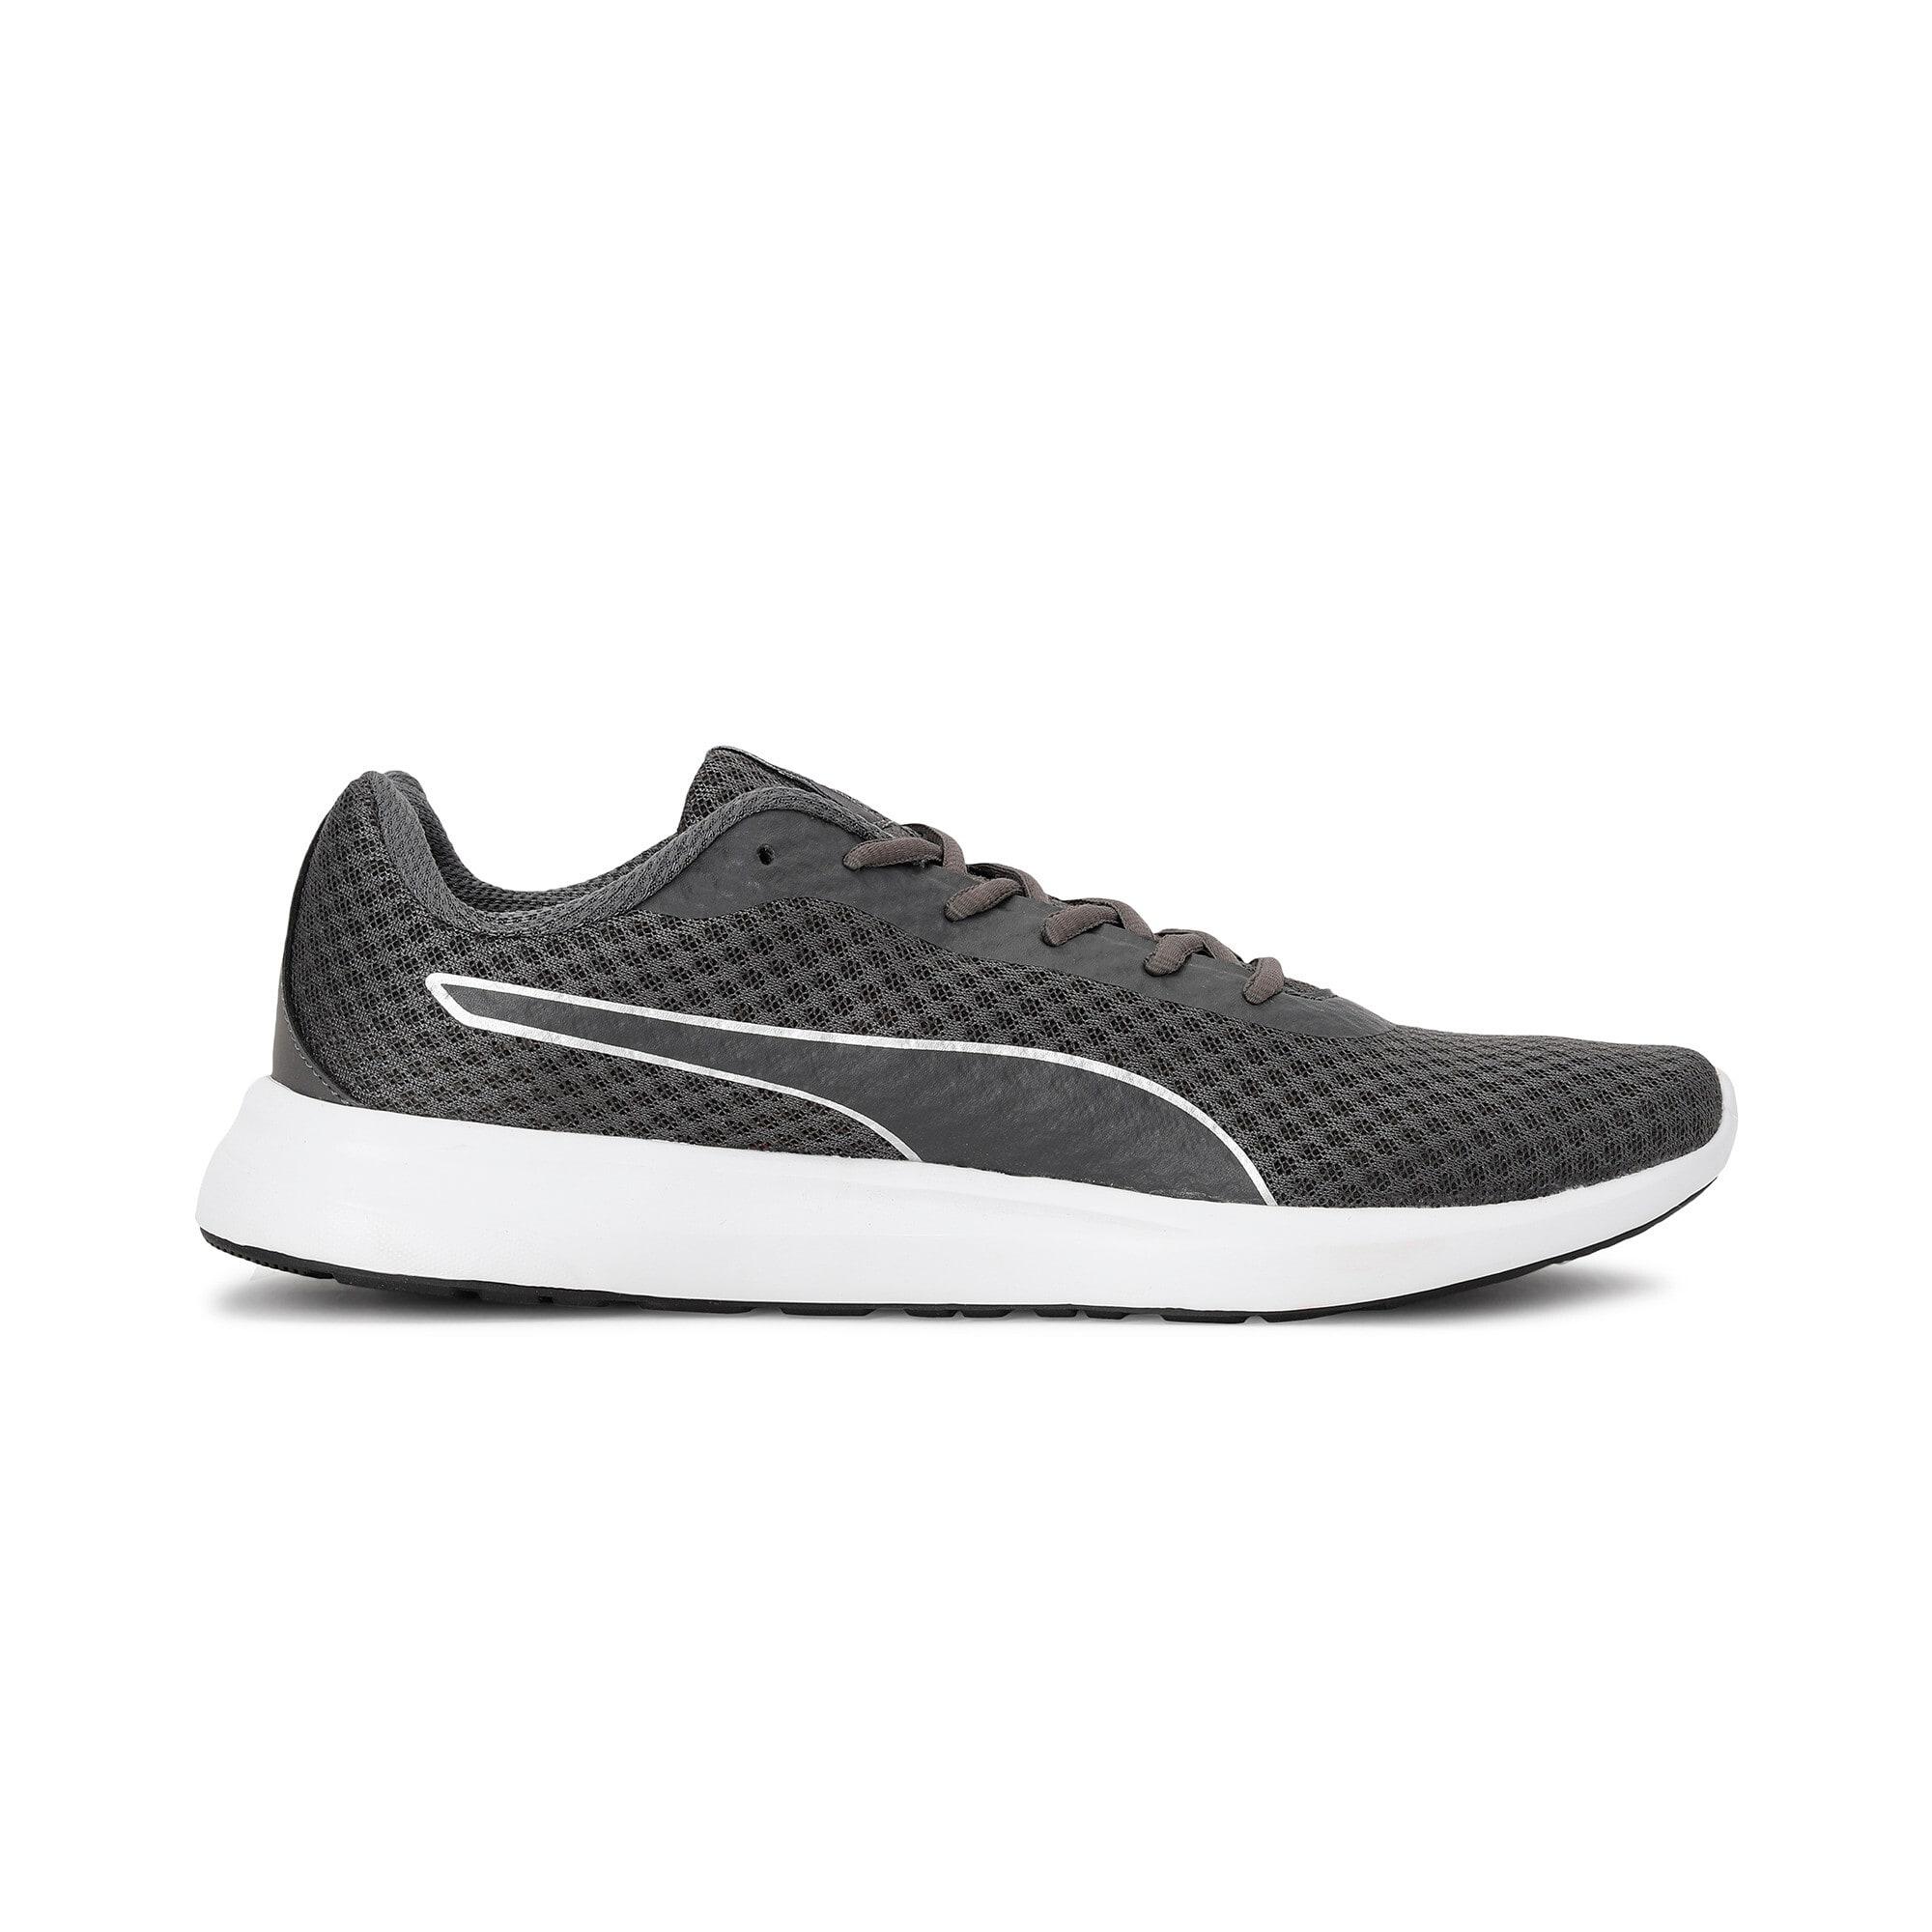 Thumbnail 5 of Propel EL IDP Men's Sportstyle Shoes, Asphalt-Silver-White-Black, medium-IND